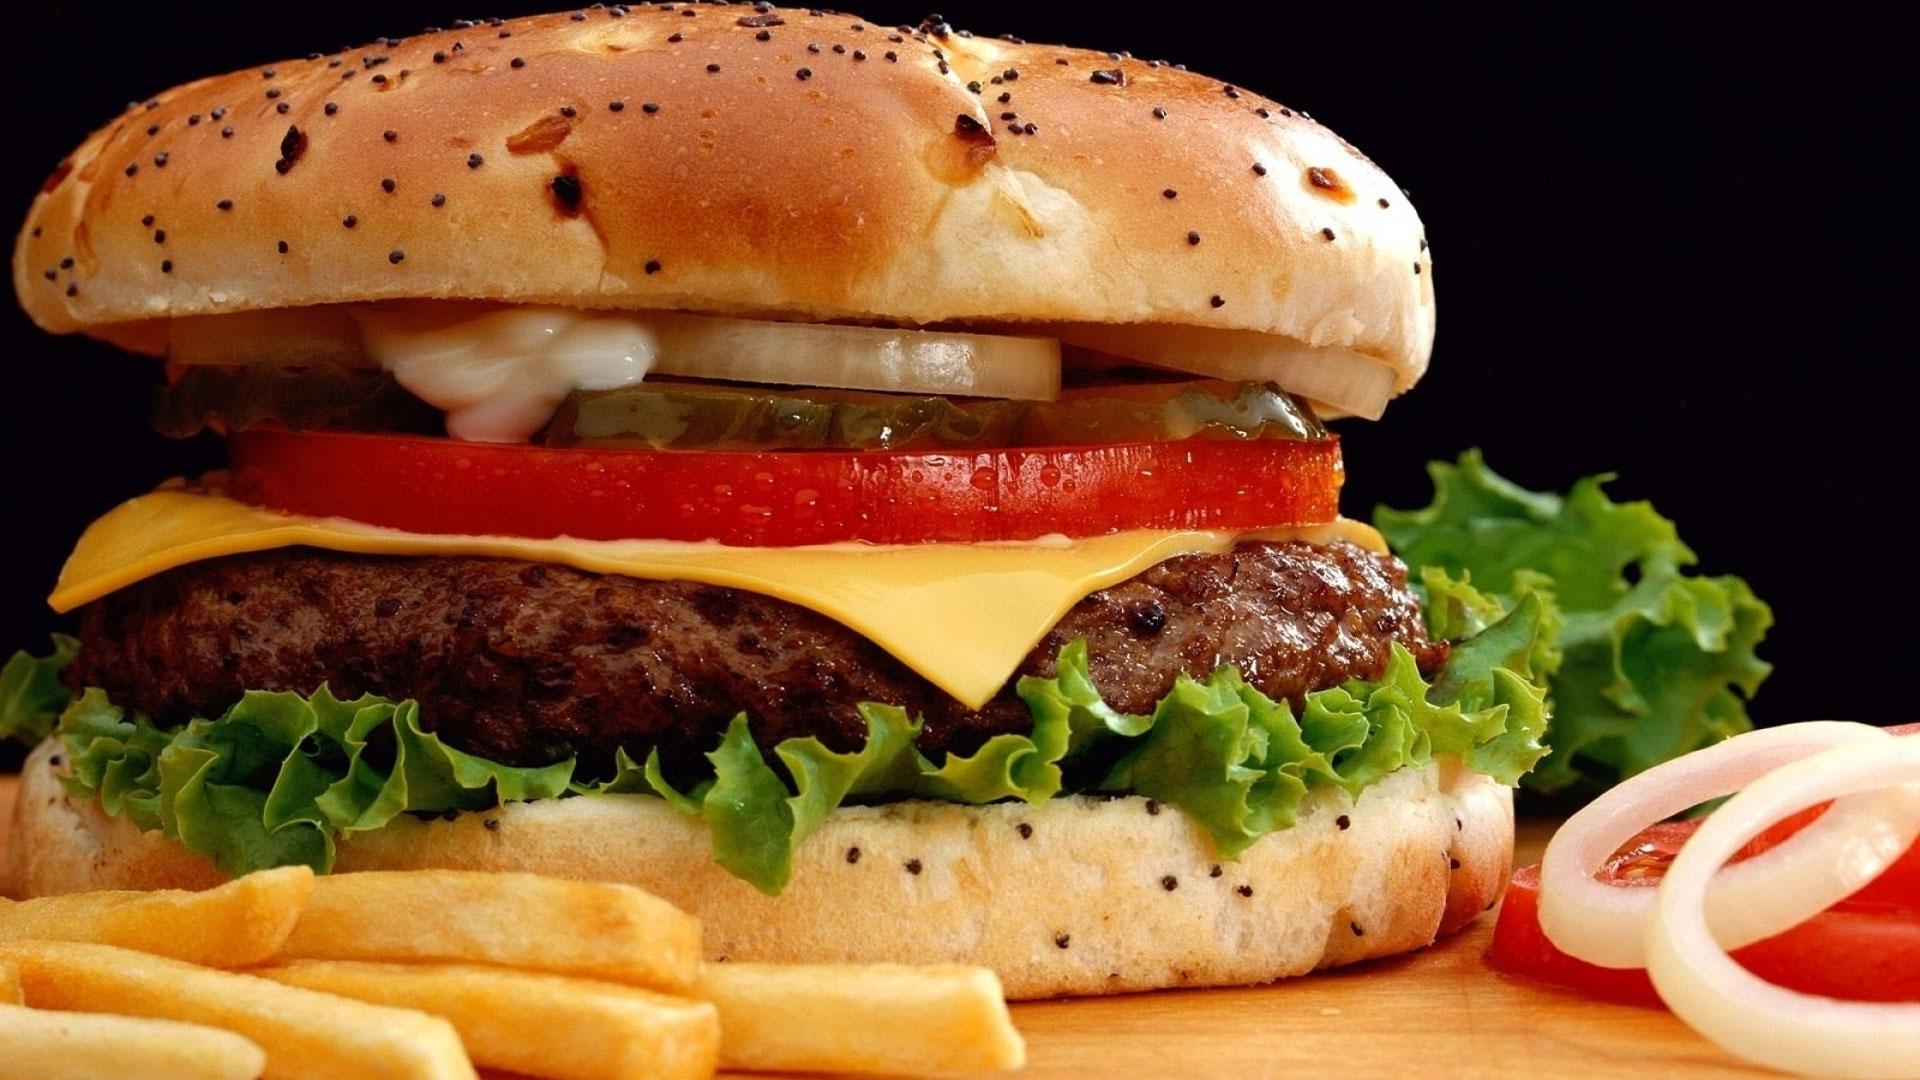 Awesome Burger Wallpaper Hi Res Images 65645